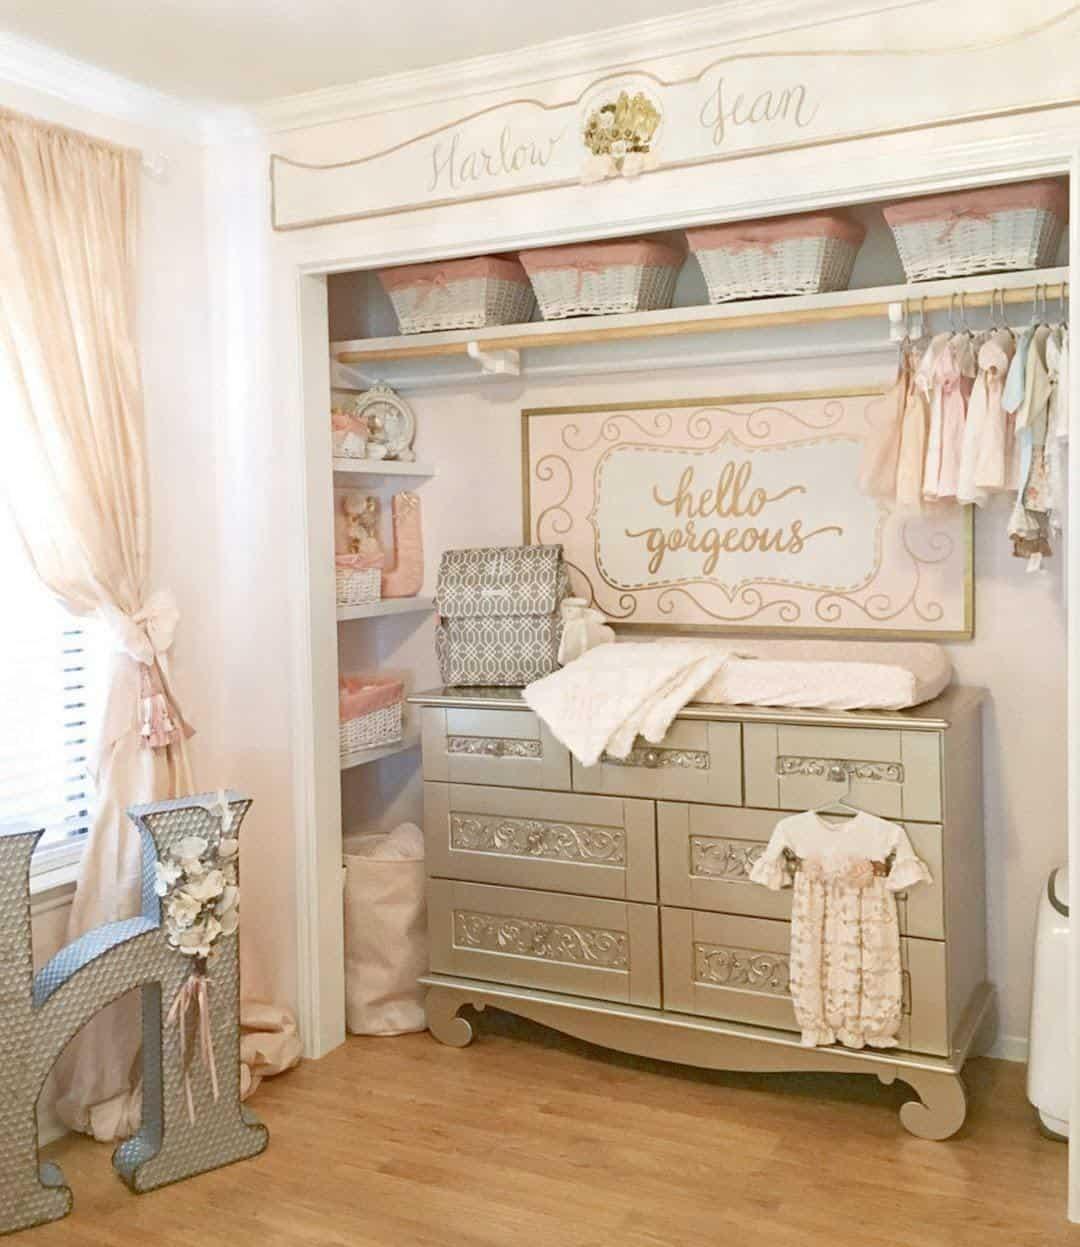 baby closet ideas - Diaper Changing Table Closet